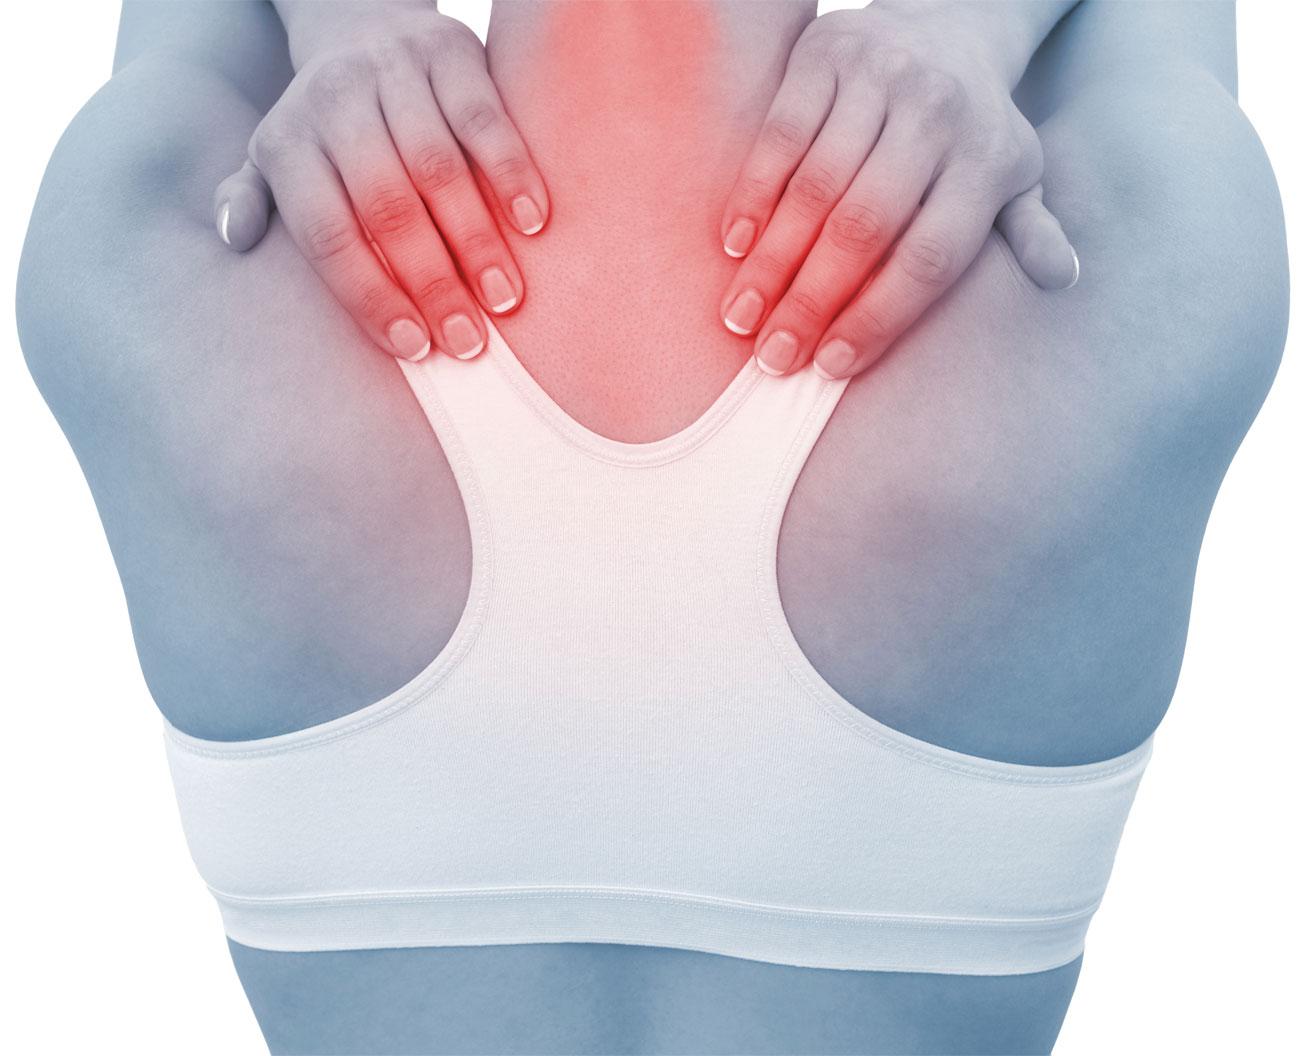 Imagen fisioterapia espalda